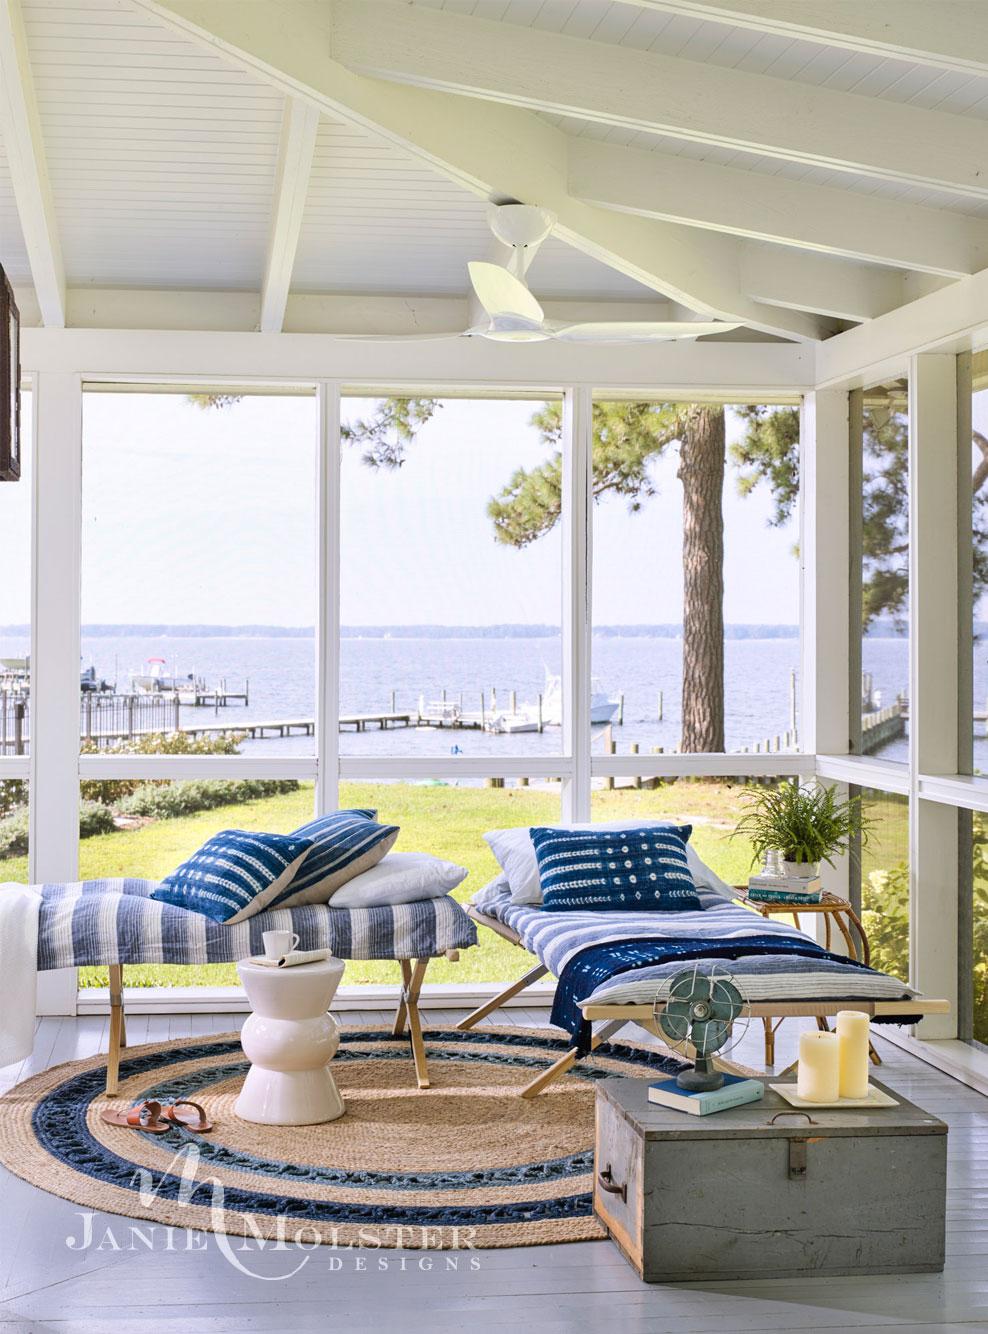 House Tour-A Sweet Beach House on Fishing Bay  21.jpg